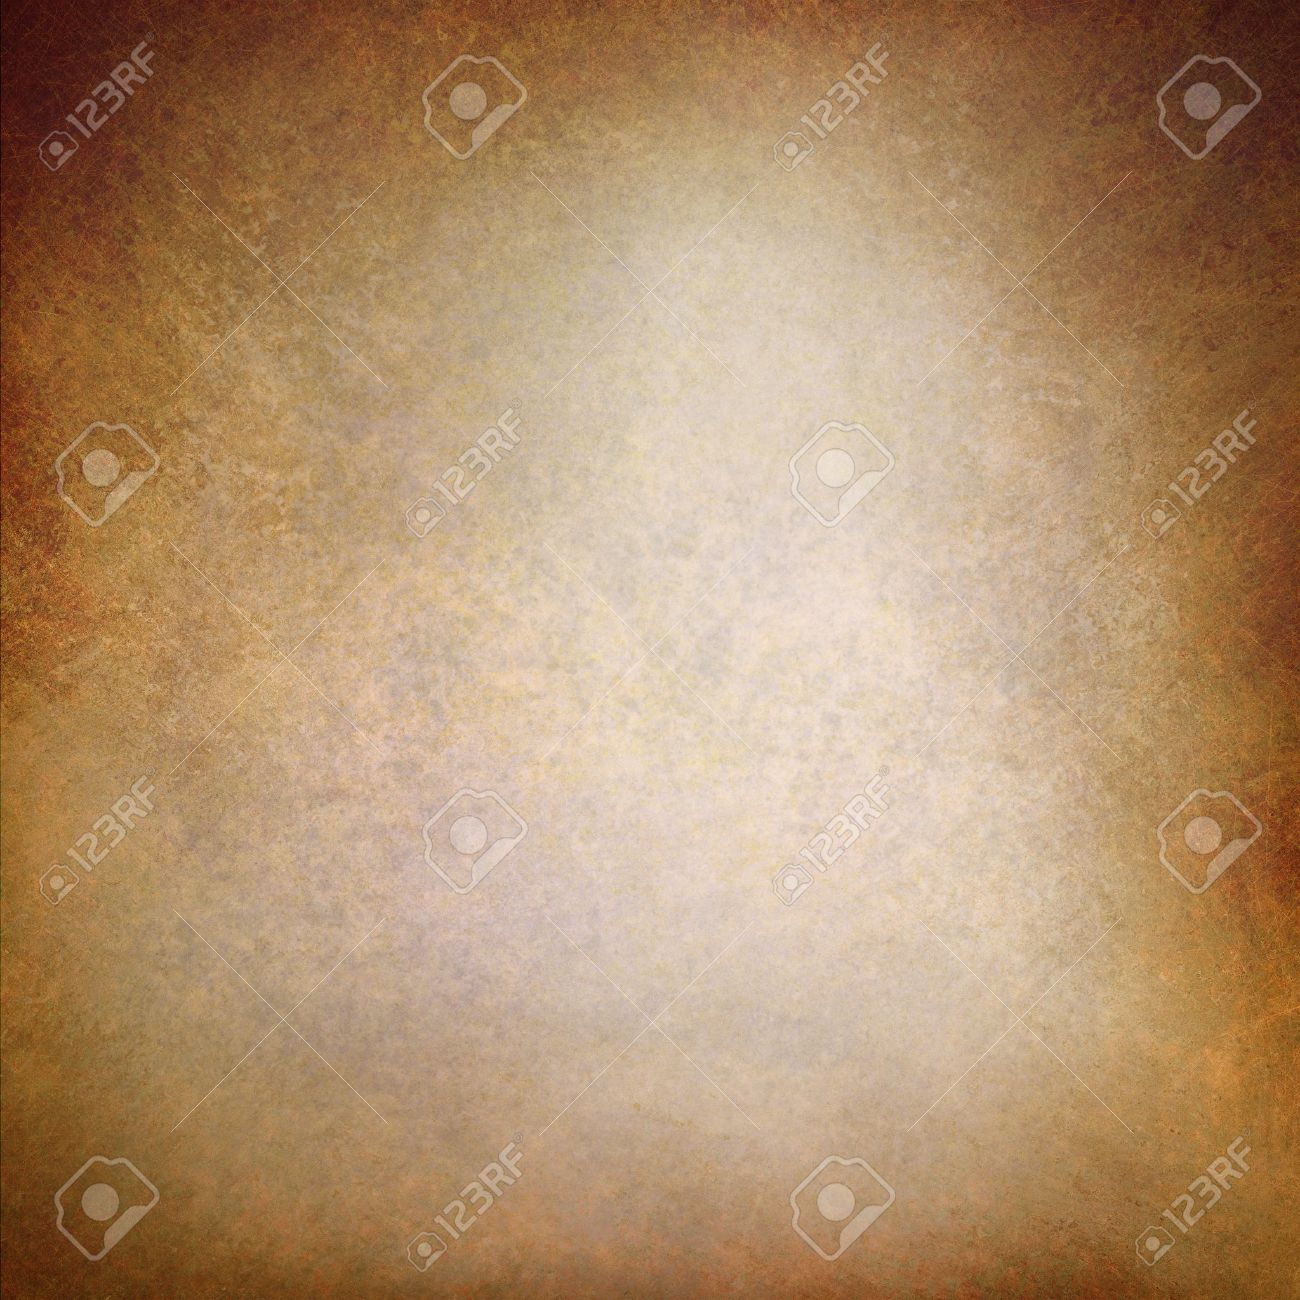 Millesime Ancien Trace Brun Texture De Fond Afflige Mur De Fond